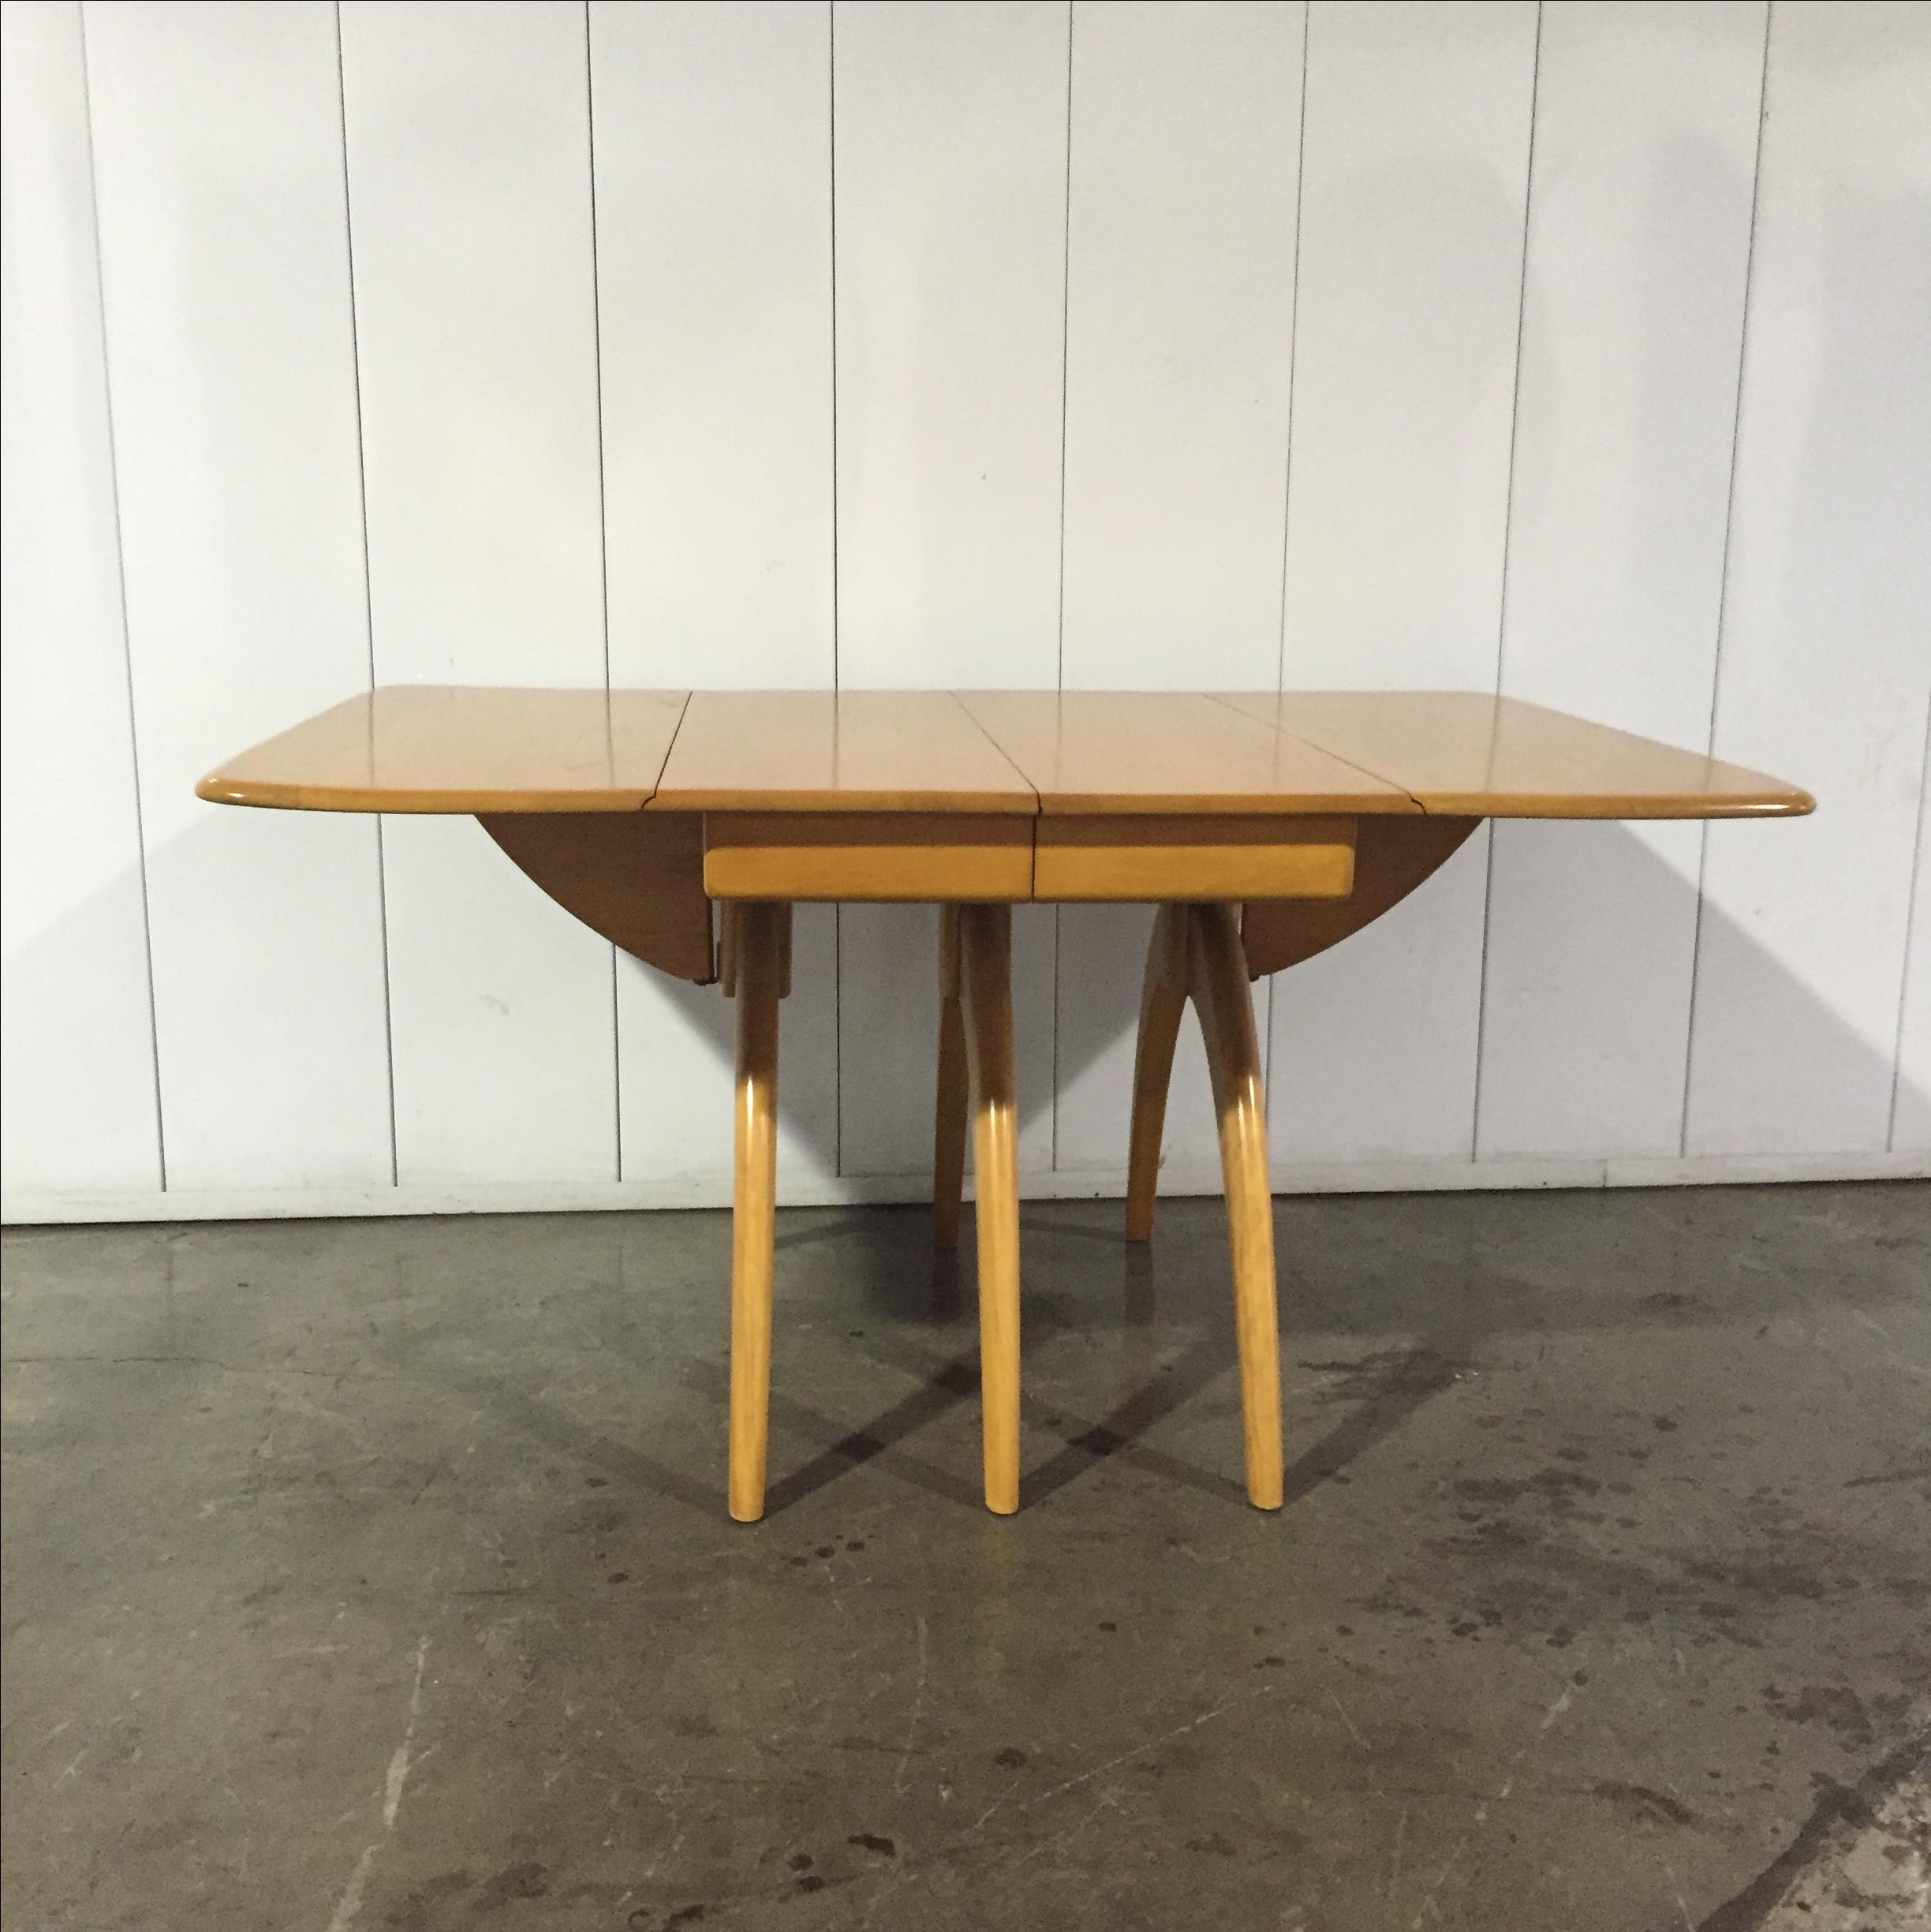 Heywood Wakefield Vintage Wishbone Dining Table Chairish : 1f5852f7 943f 4aab 8fc3 8be64f2d68c9aspectfitampwidth640ampheight640 from www.chairish.com size 640 x 640 jpeg 39kB